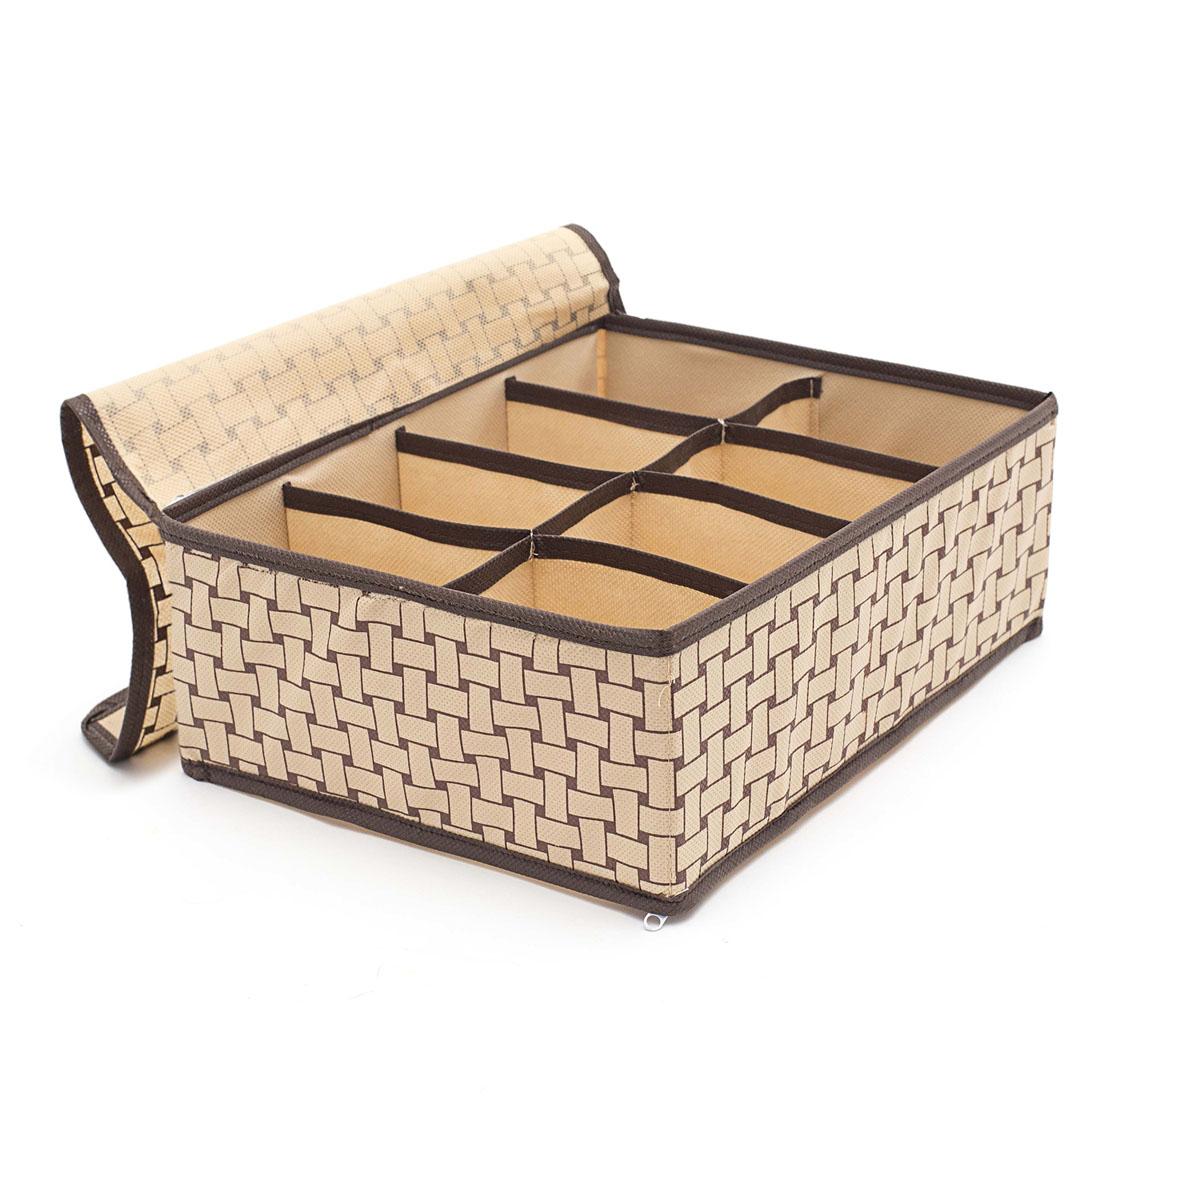 Органайзер для хранения вещей Homsu Pletenka, с крышкой, 8 секций, 31 х 24 х 11 см органайзер homsu hipster style 31 х 24 х 11 см hom 759